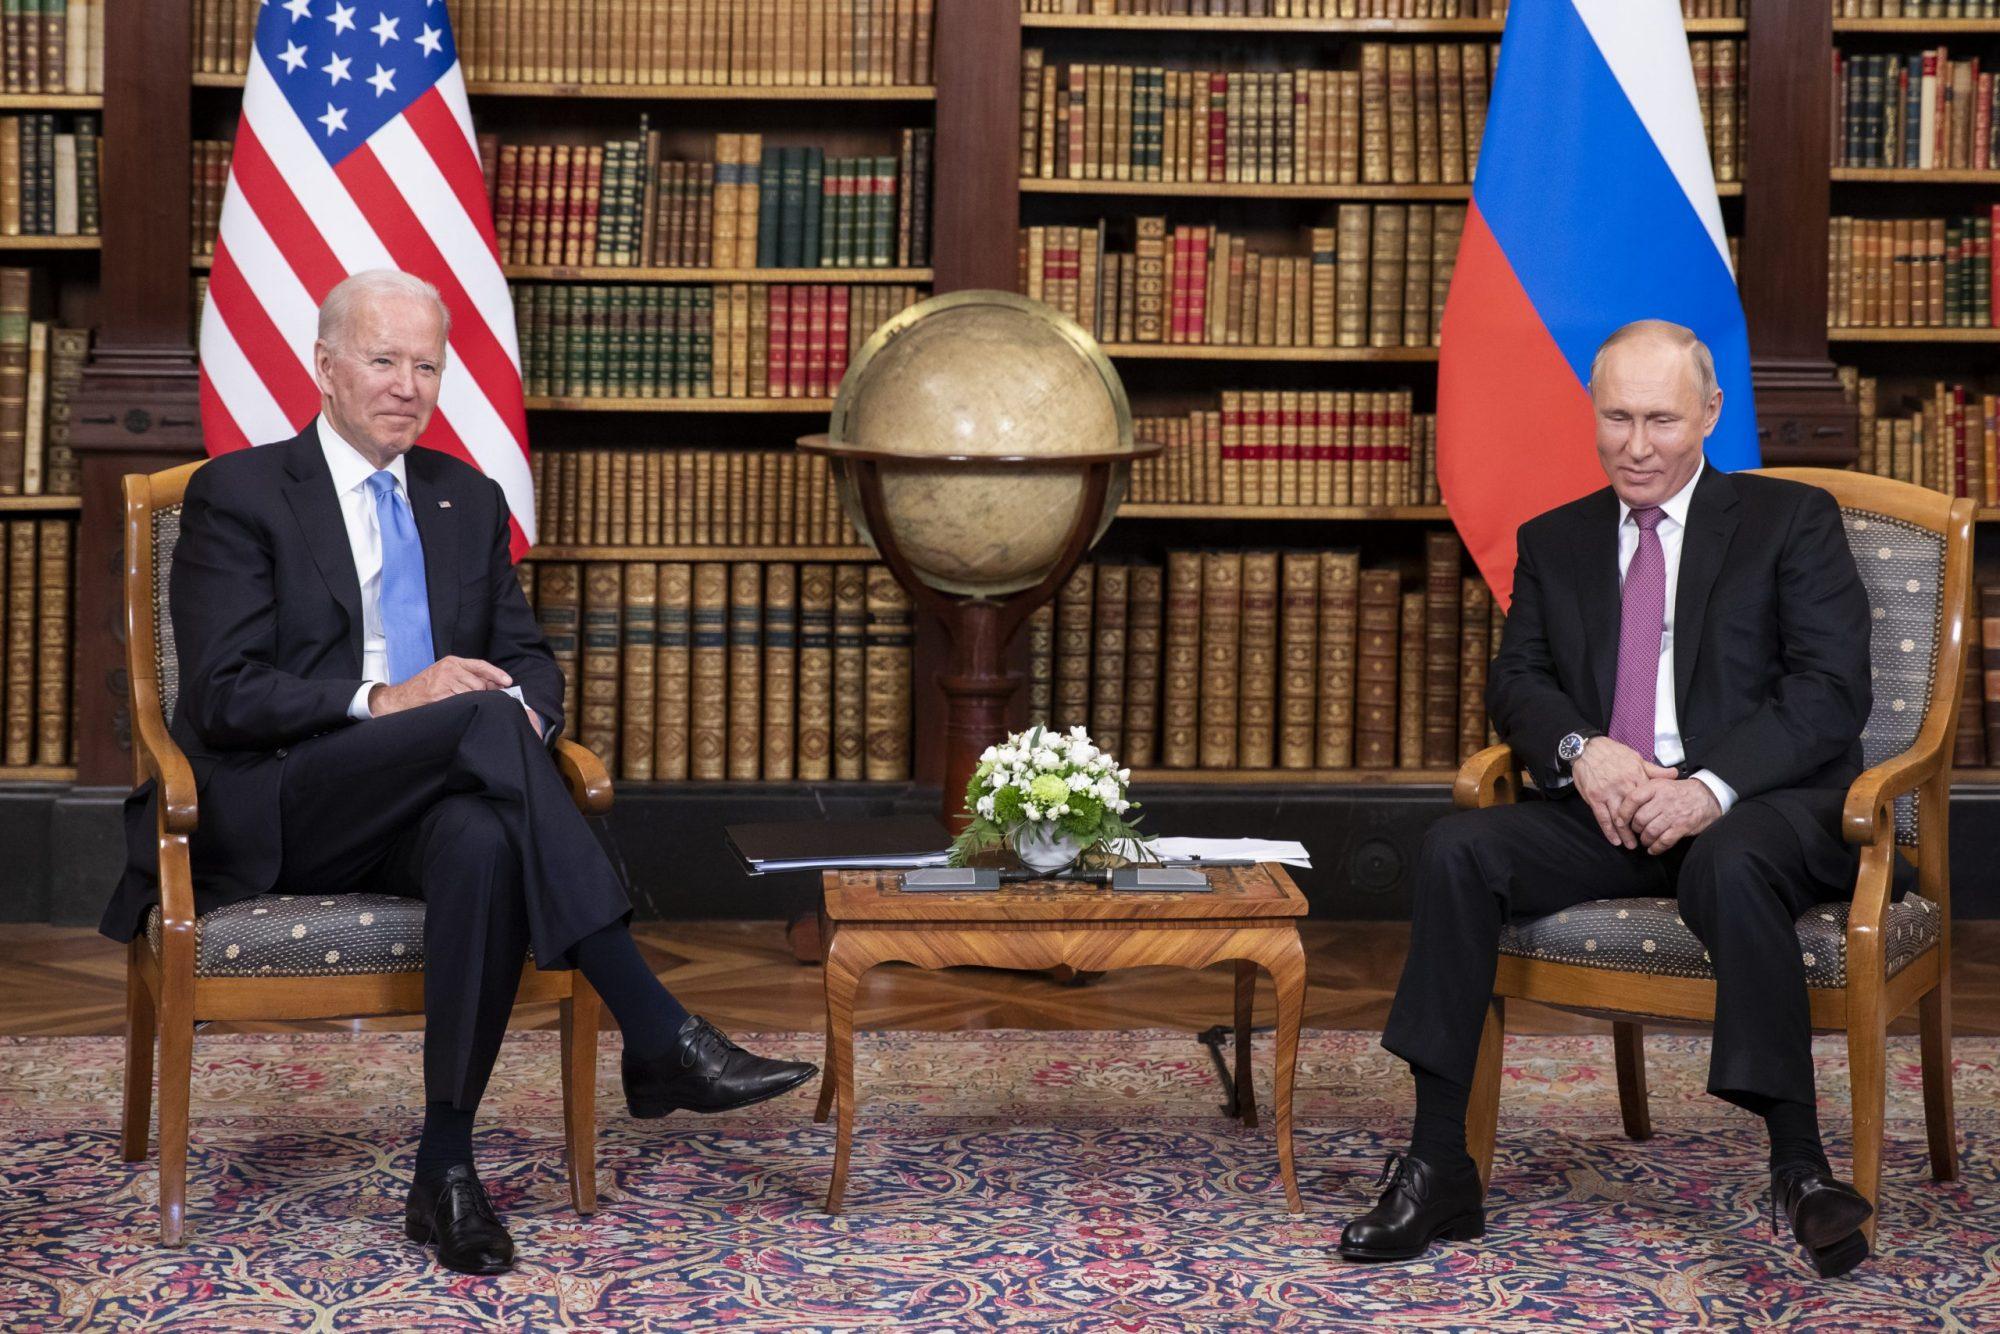 Critical cyber targets: You can't touch this (again), Biden tells Putin